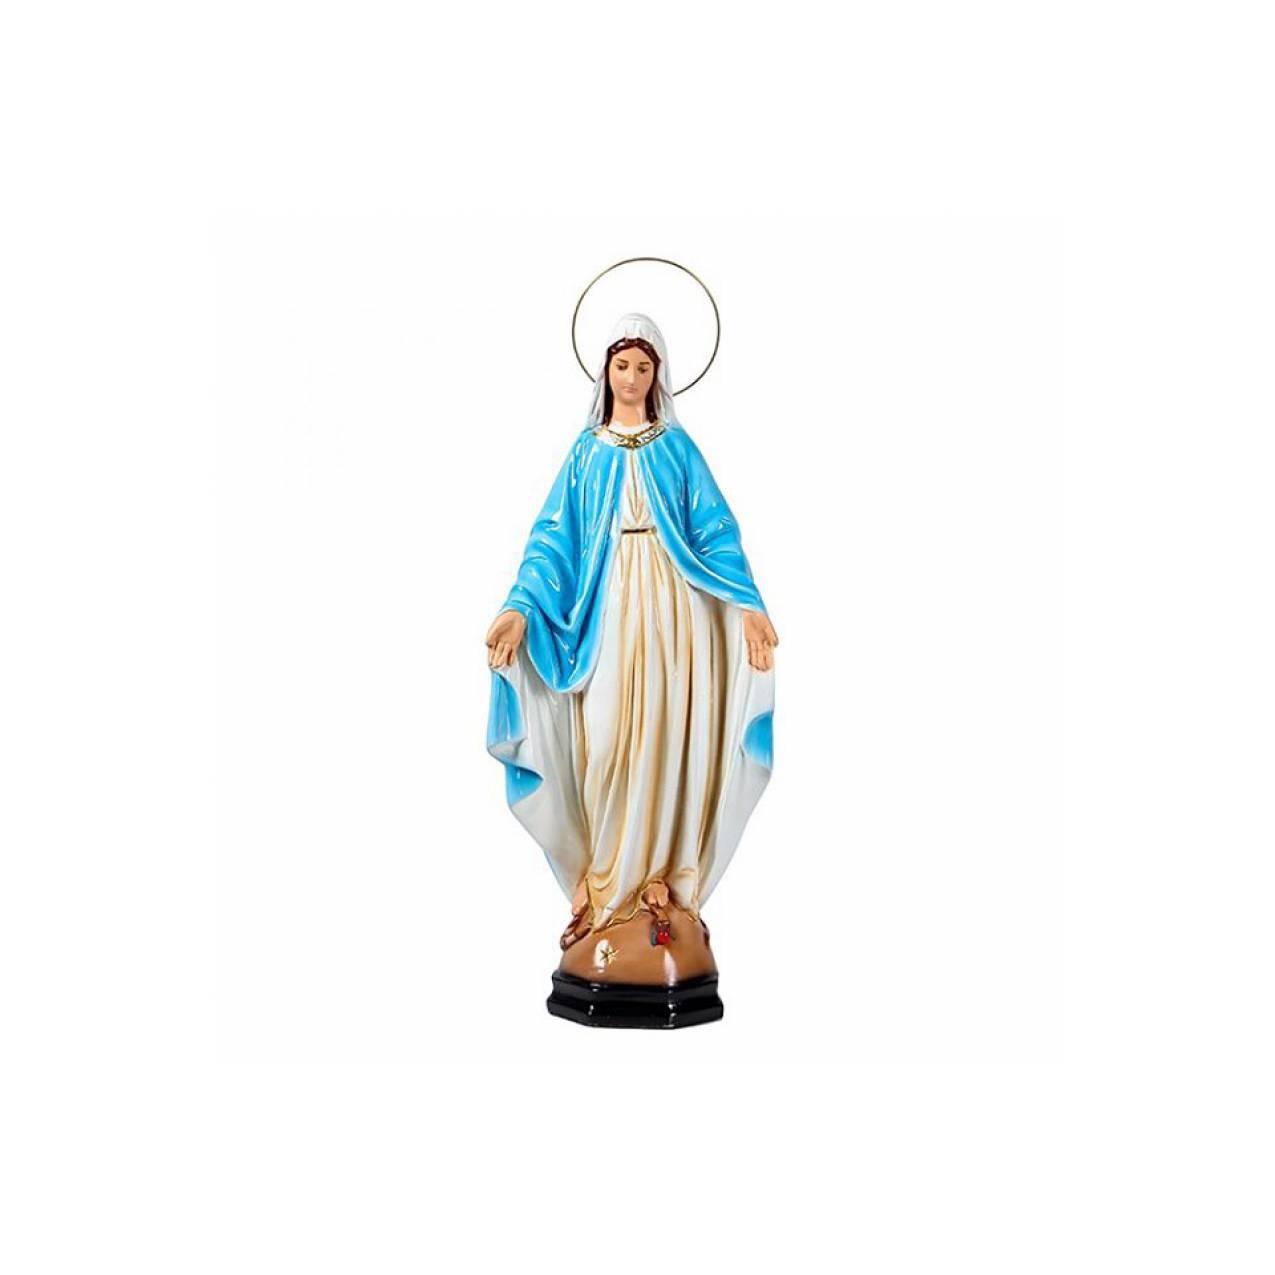 Ohome Decor 3d Bunda Maria Dan Bayi Yesus Patung Keramik Pajangan Kakek Nenek Jahit Sofa Oldman Tangan Terbuka Mantila Putih 60cm